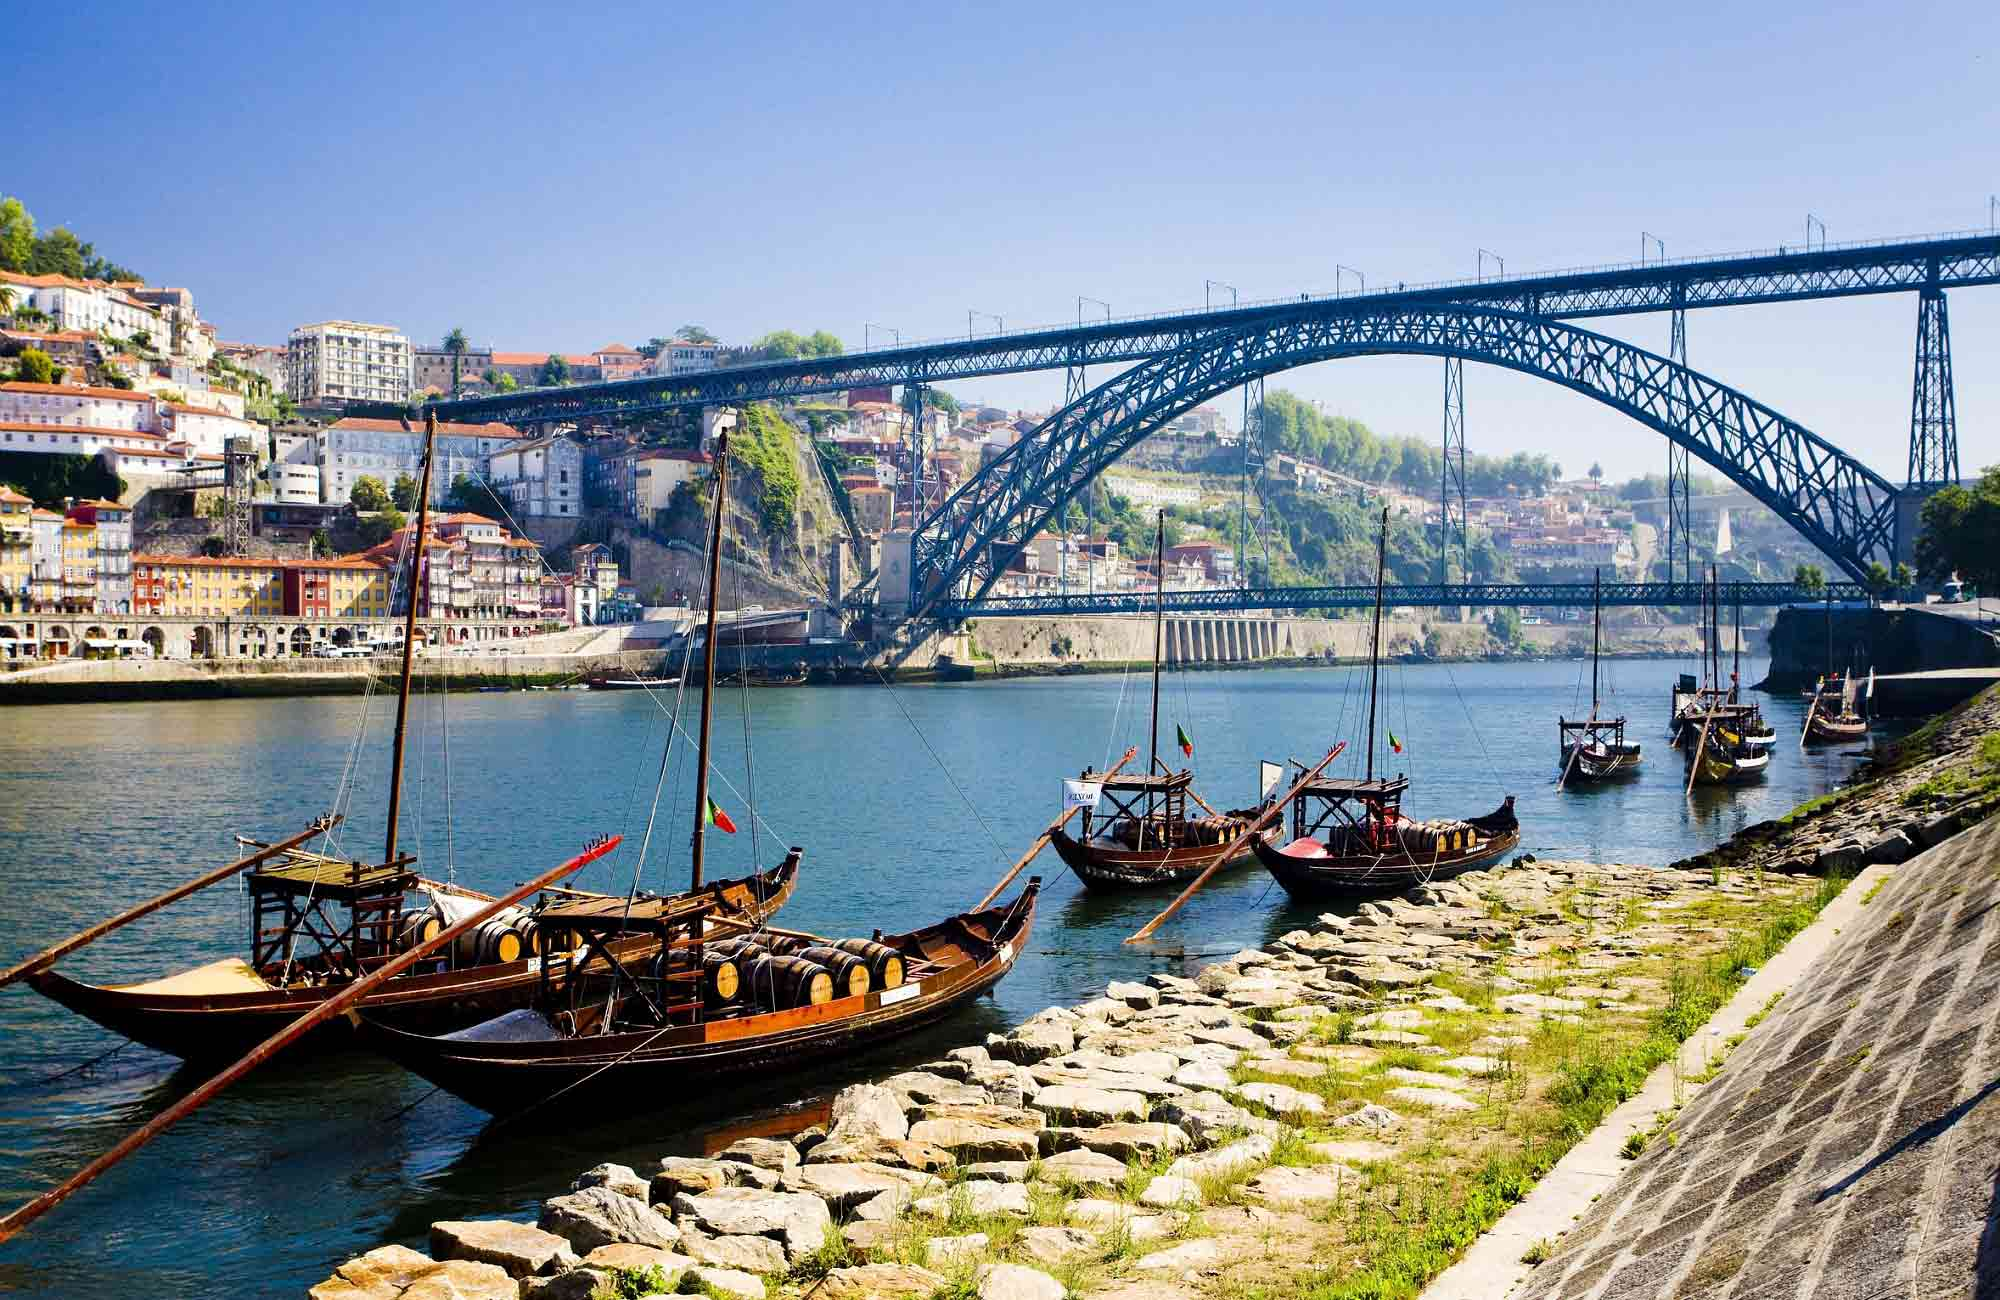 Voyage Portugal - Porto-Pont Dom-Luís - Amplitudes